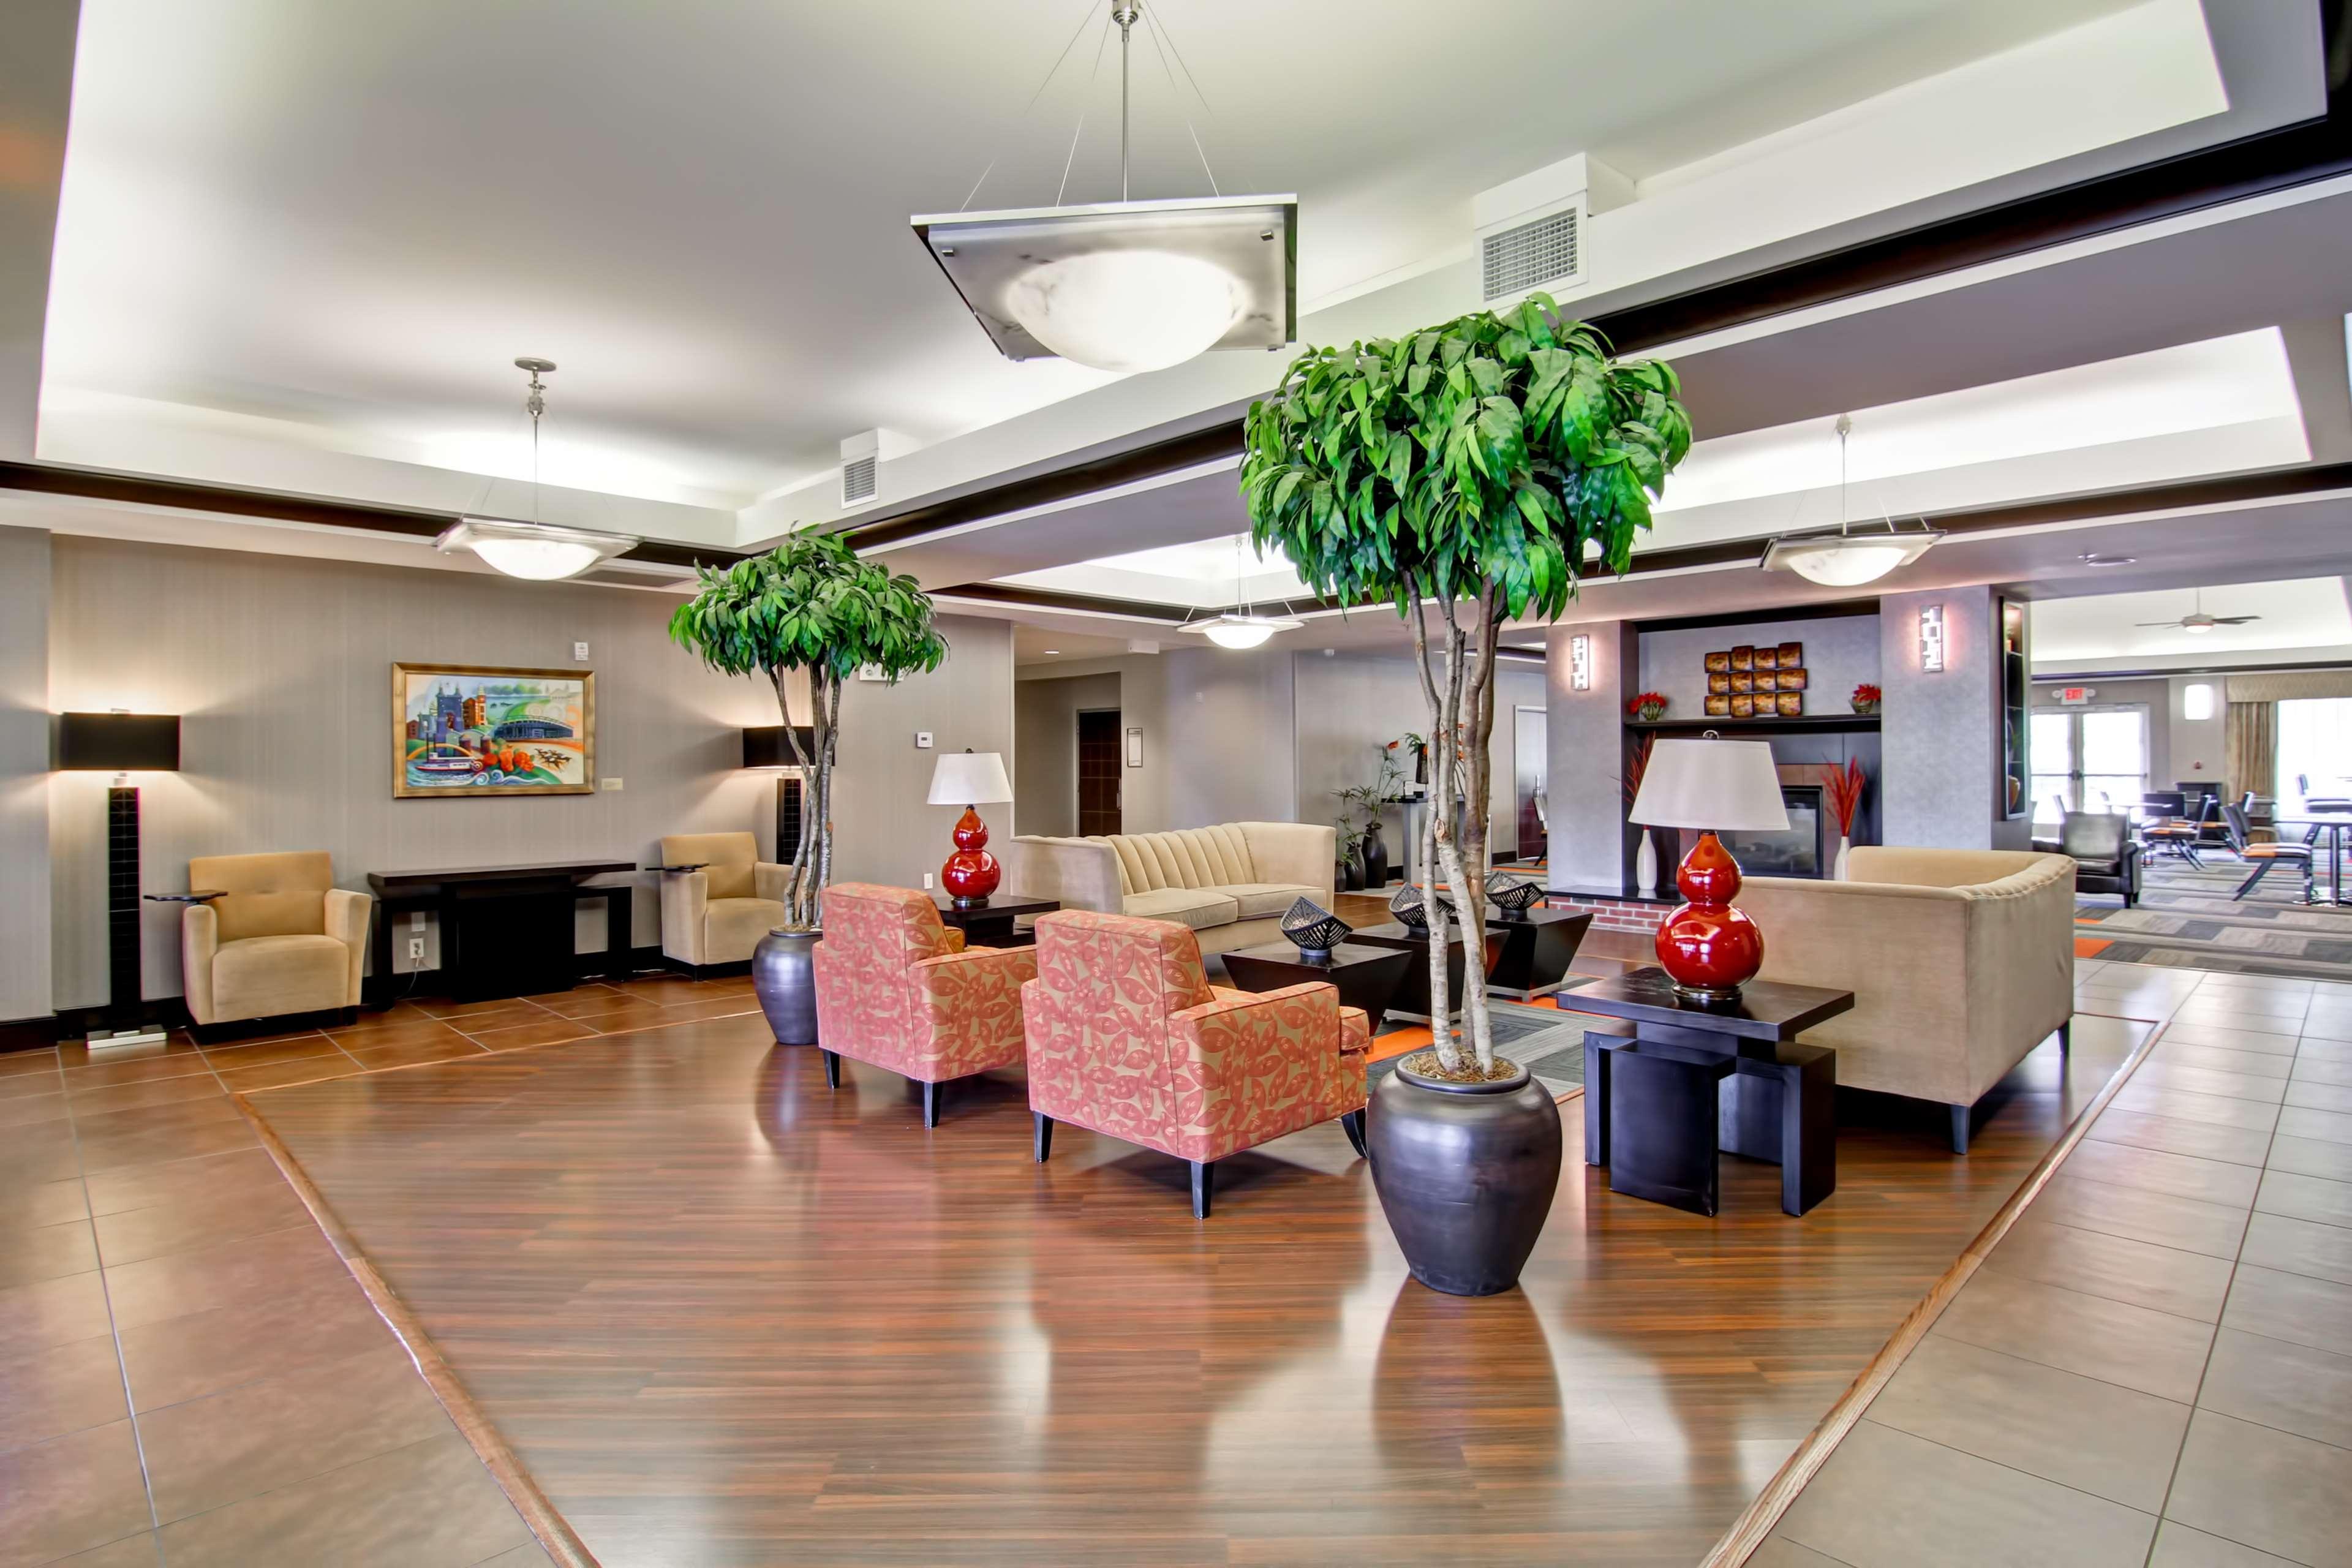 Homewood Suites by Hilton Cincinnati Airport South-Florence image 3